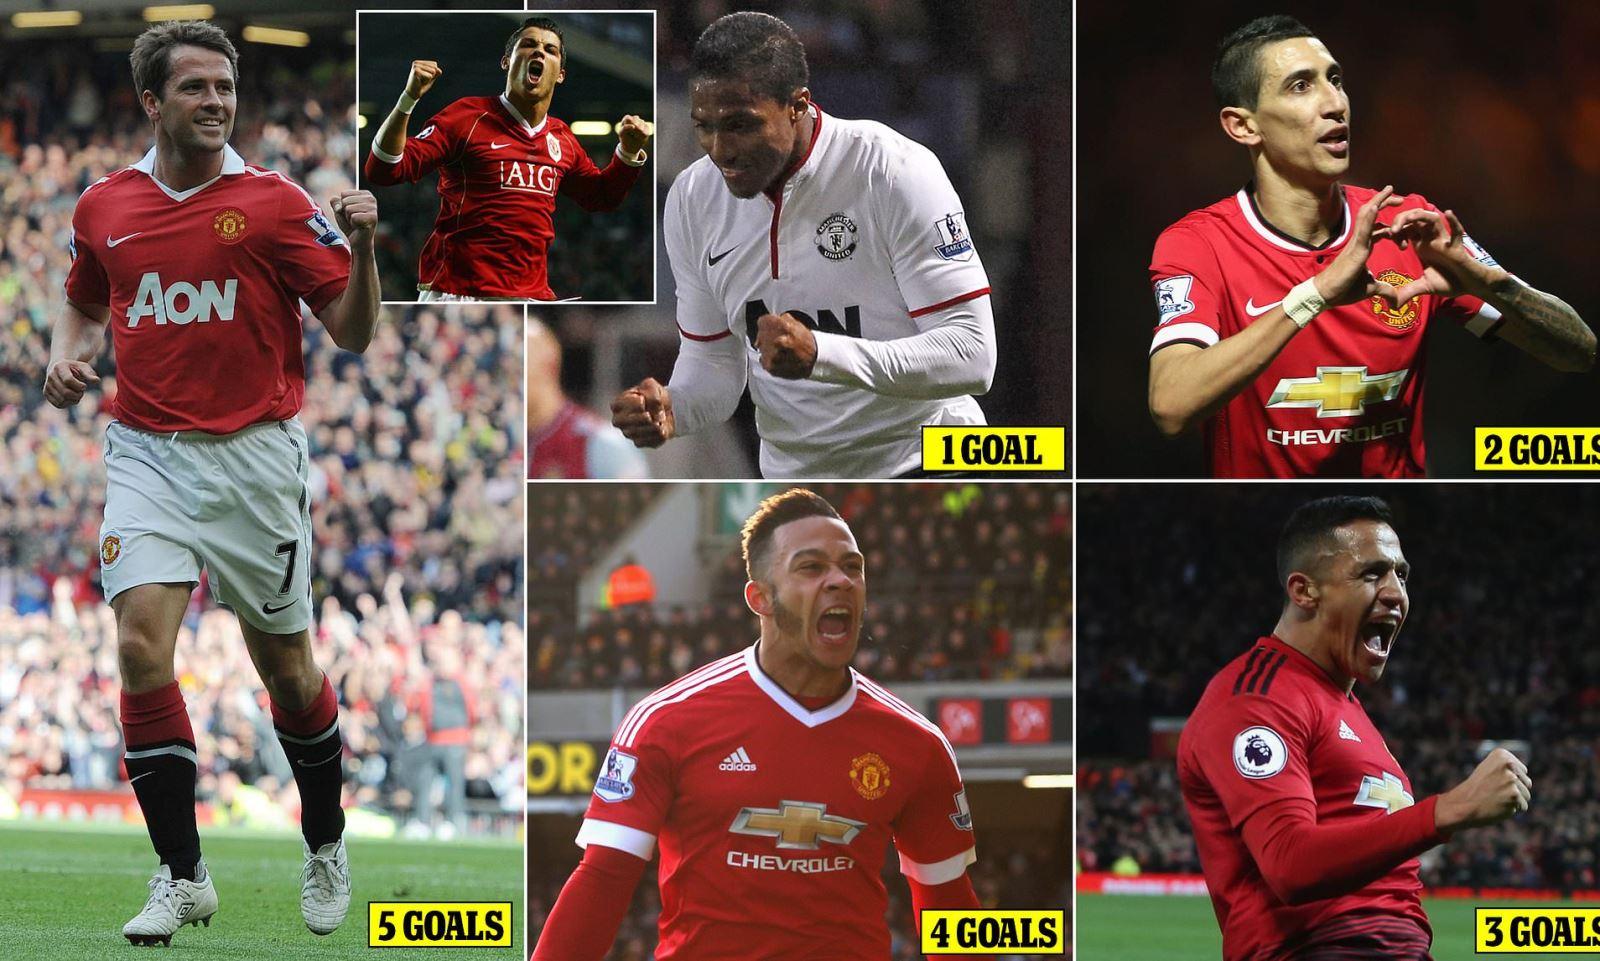 mu, manchester united, áo số 7, Cristiano Ronaldo, Michael Owen, Antonio Valencia, Angel Di Maria, Memphis Depay, Alexis Sanchez